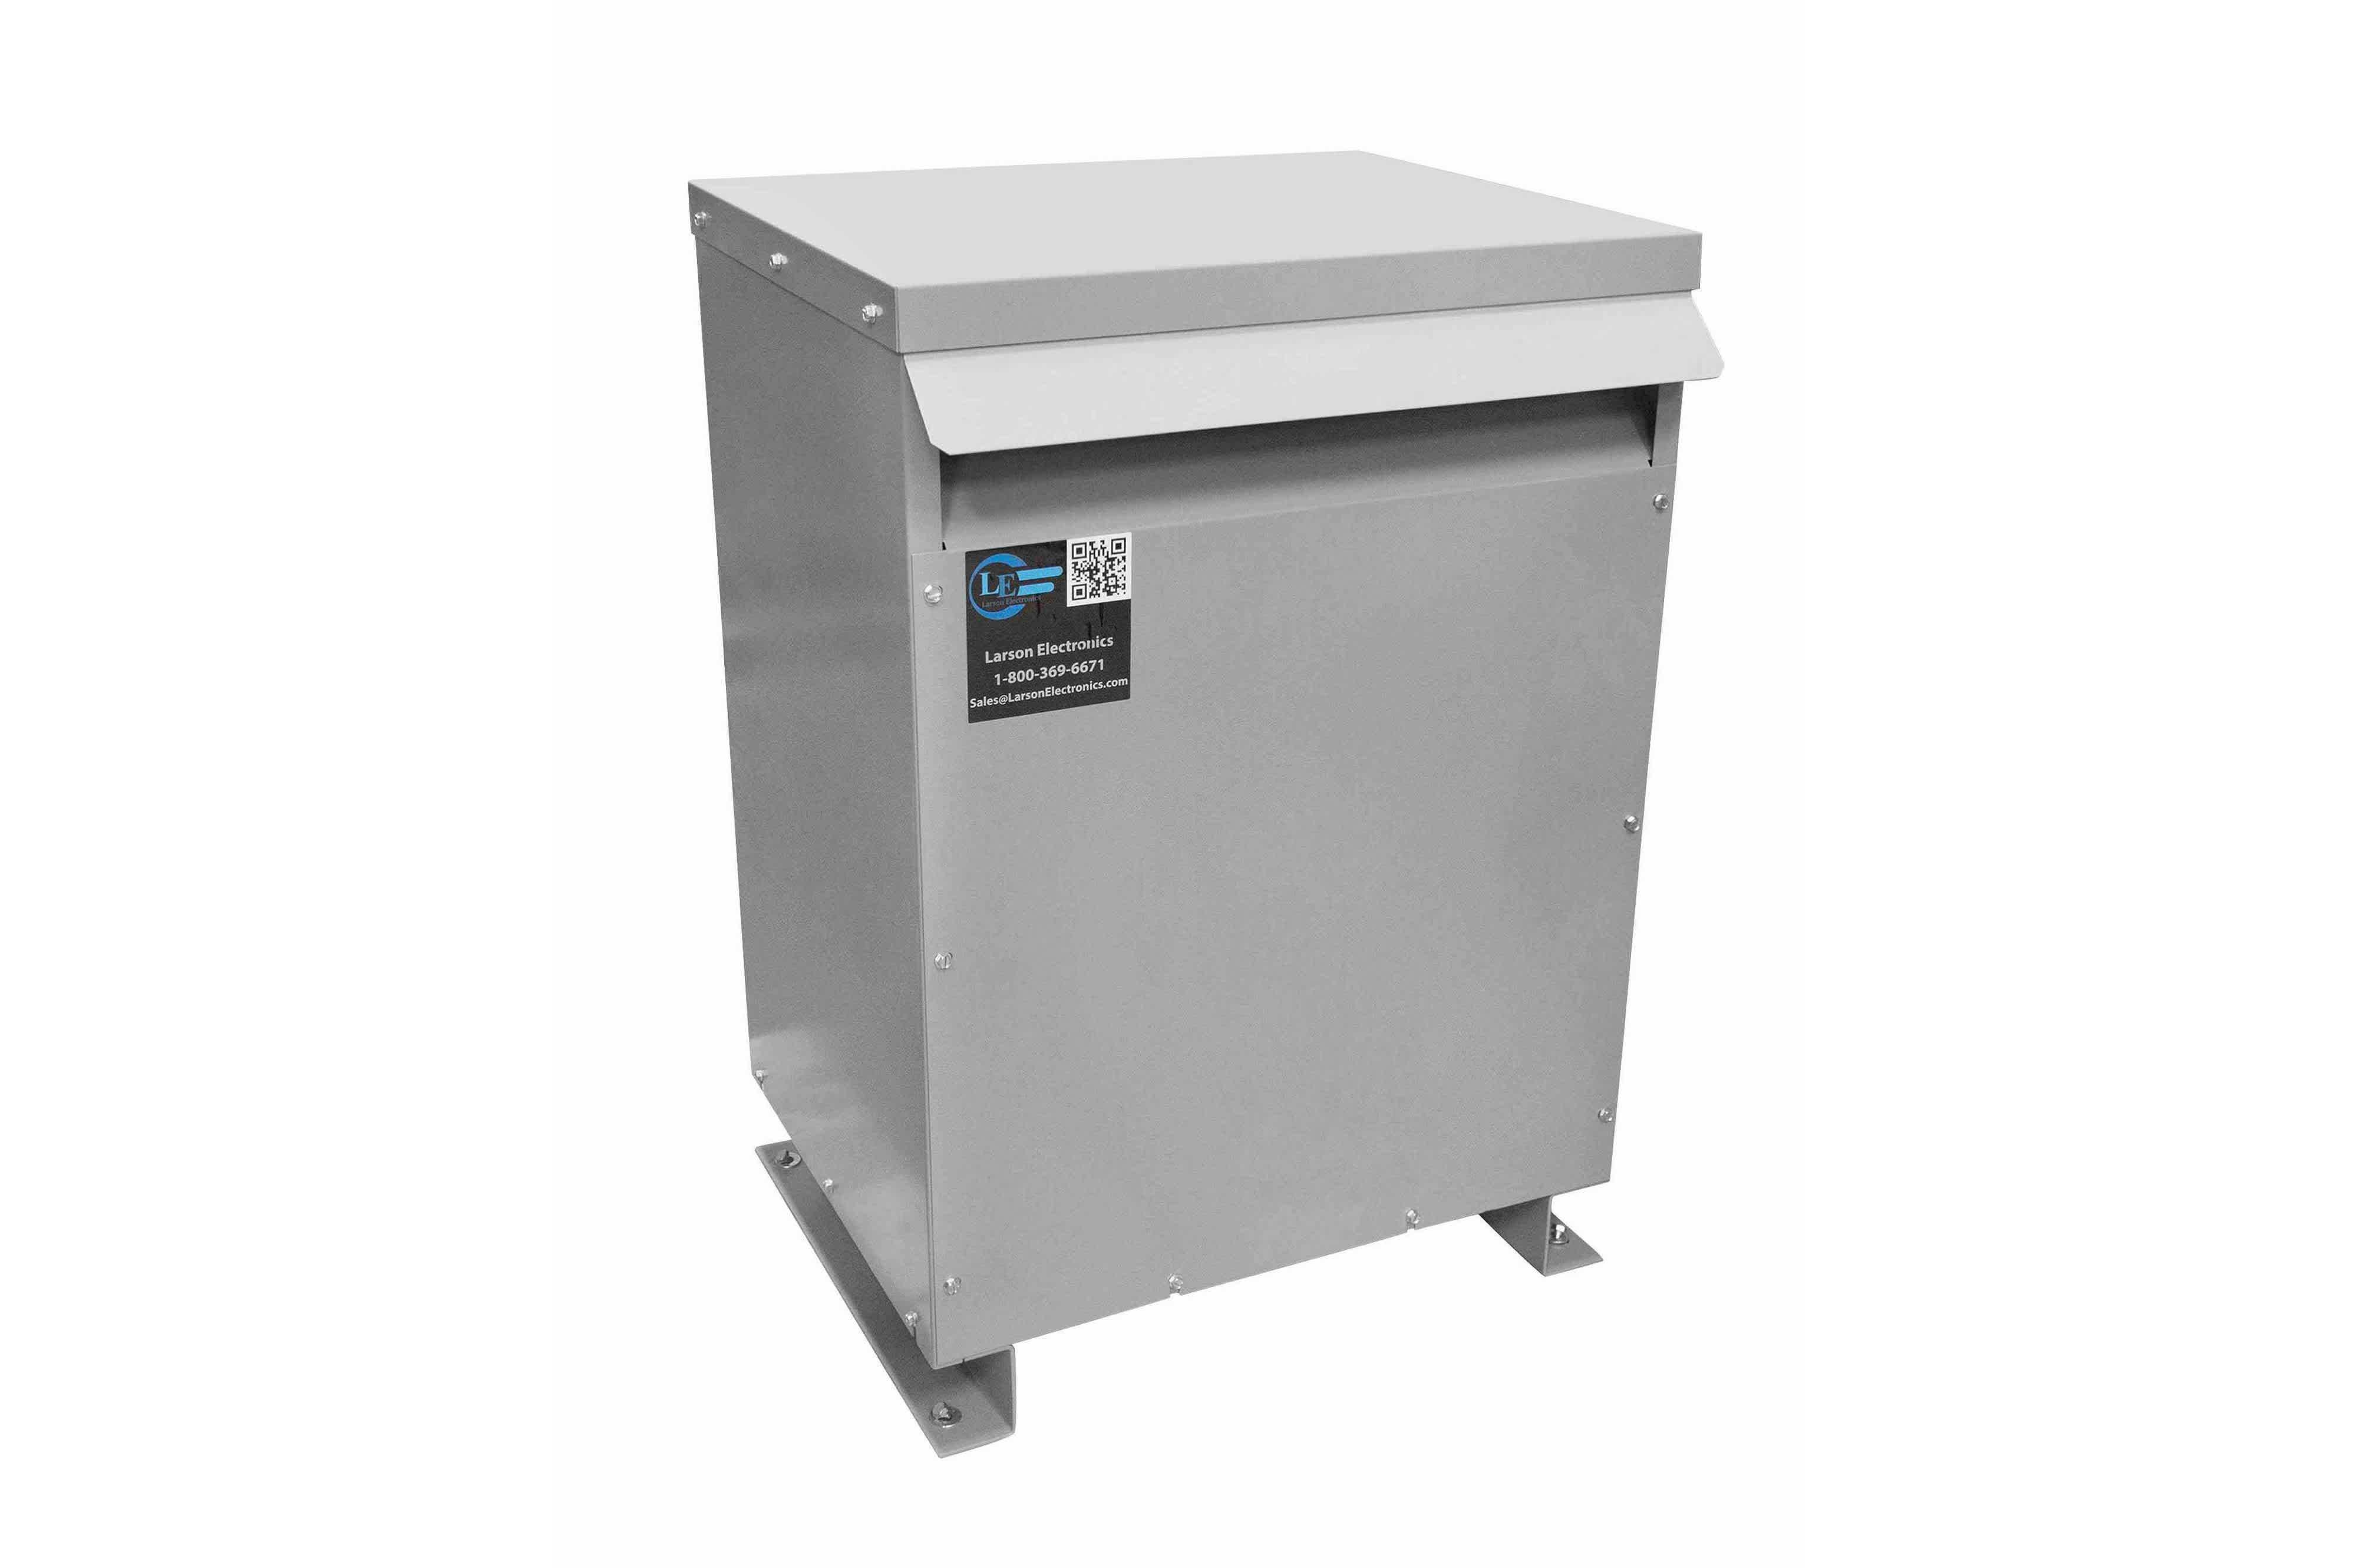 167 kVA 3PH DOE Transformer, 400V Delta Primary, 208Y/120 Wye-N Secondary, N3R, Ventilated, 60 Hz